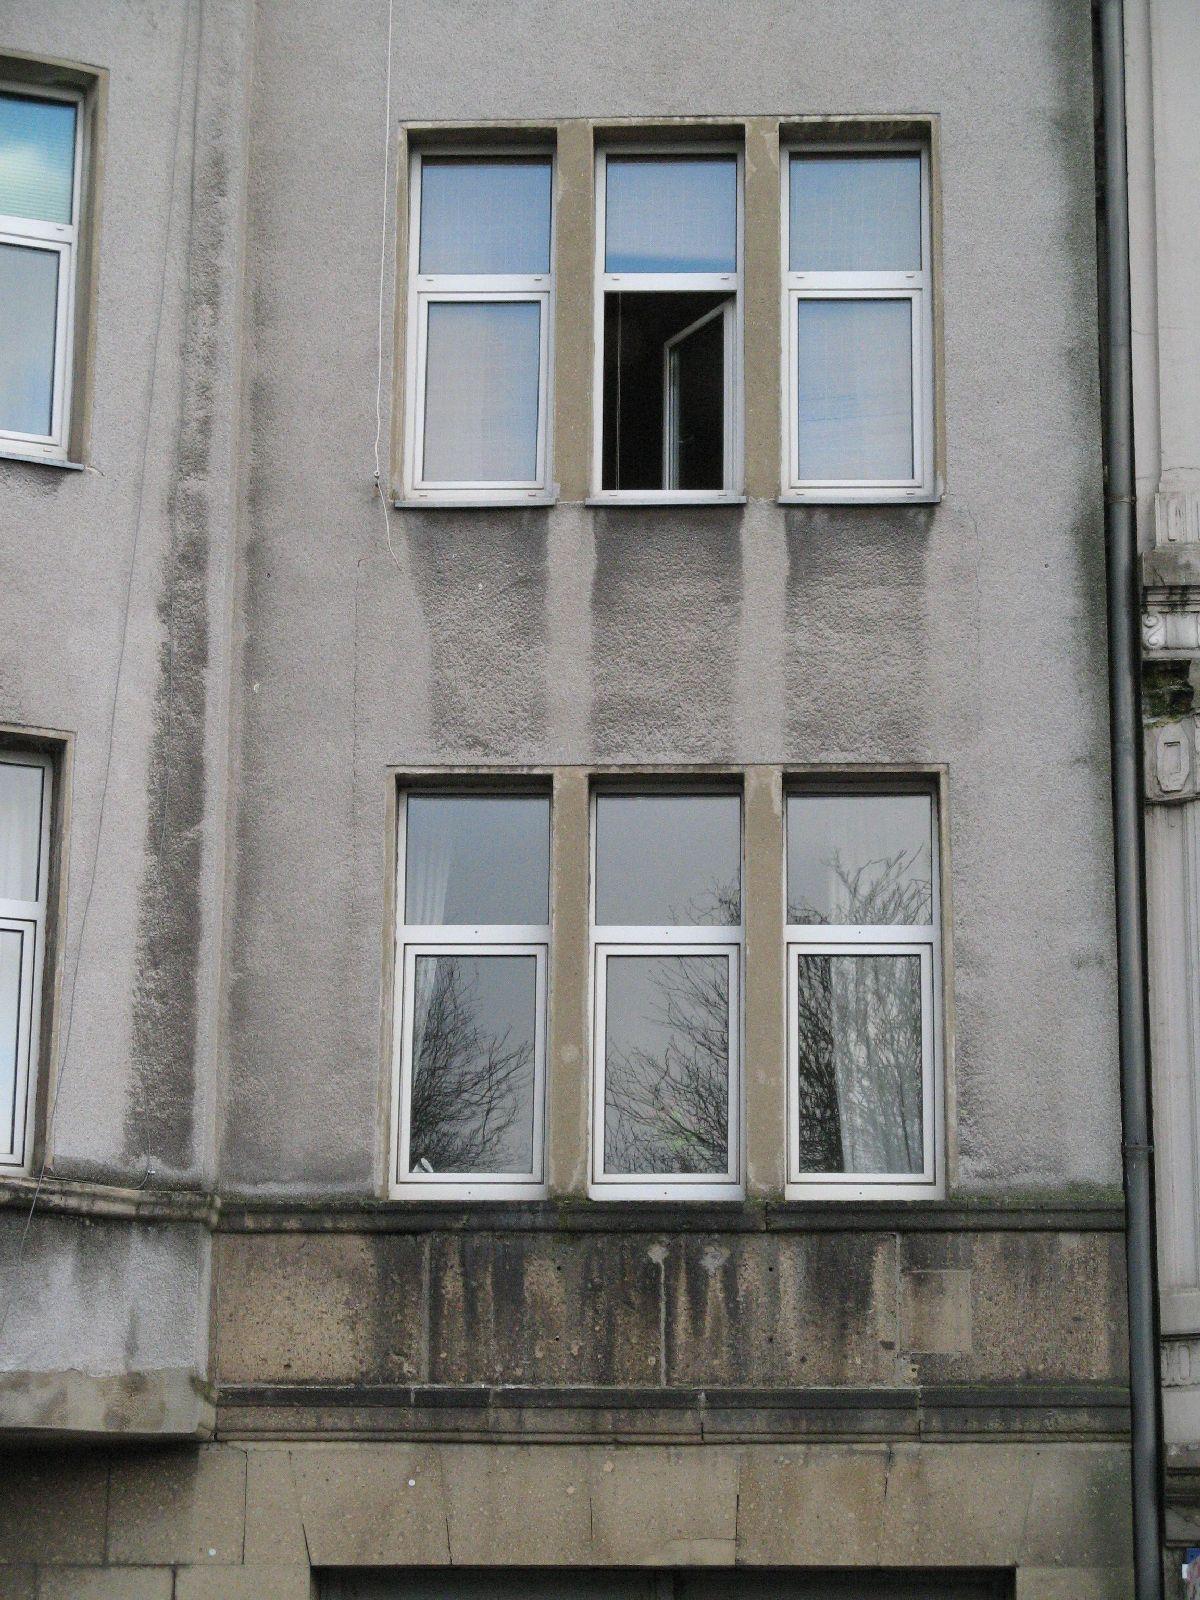 Gebaeude-Architektur_Textur_B_03756